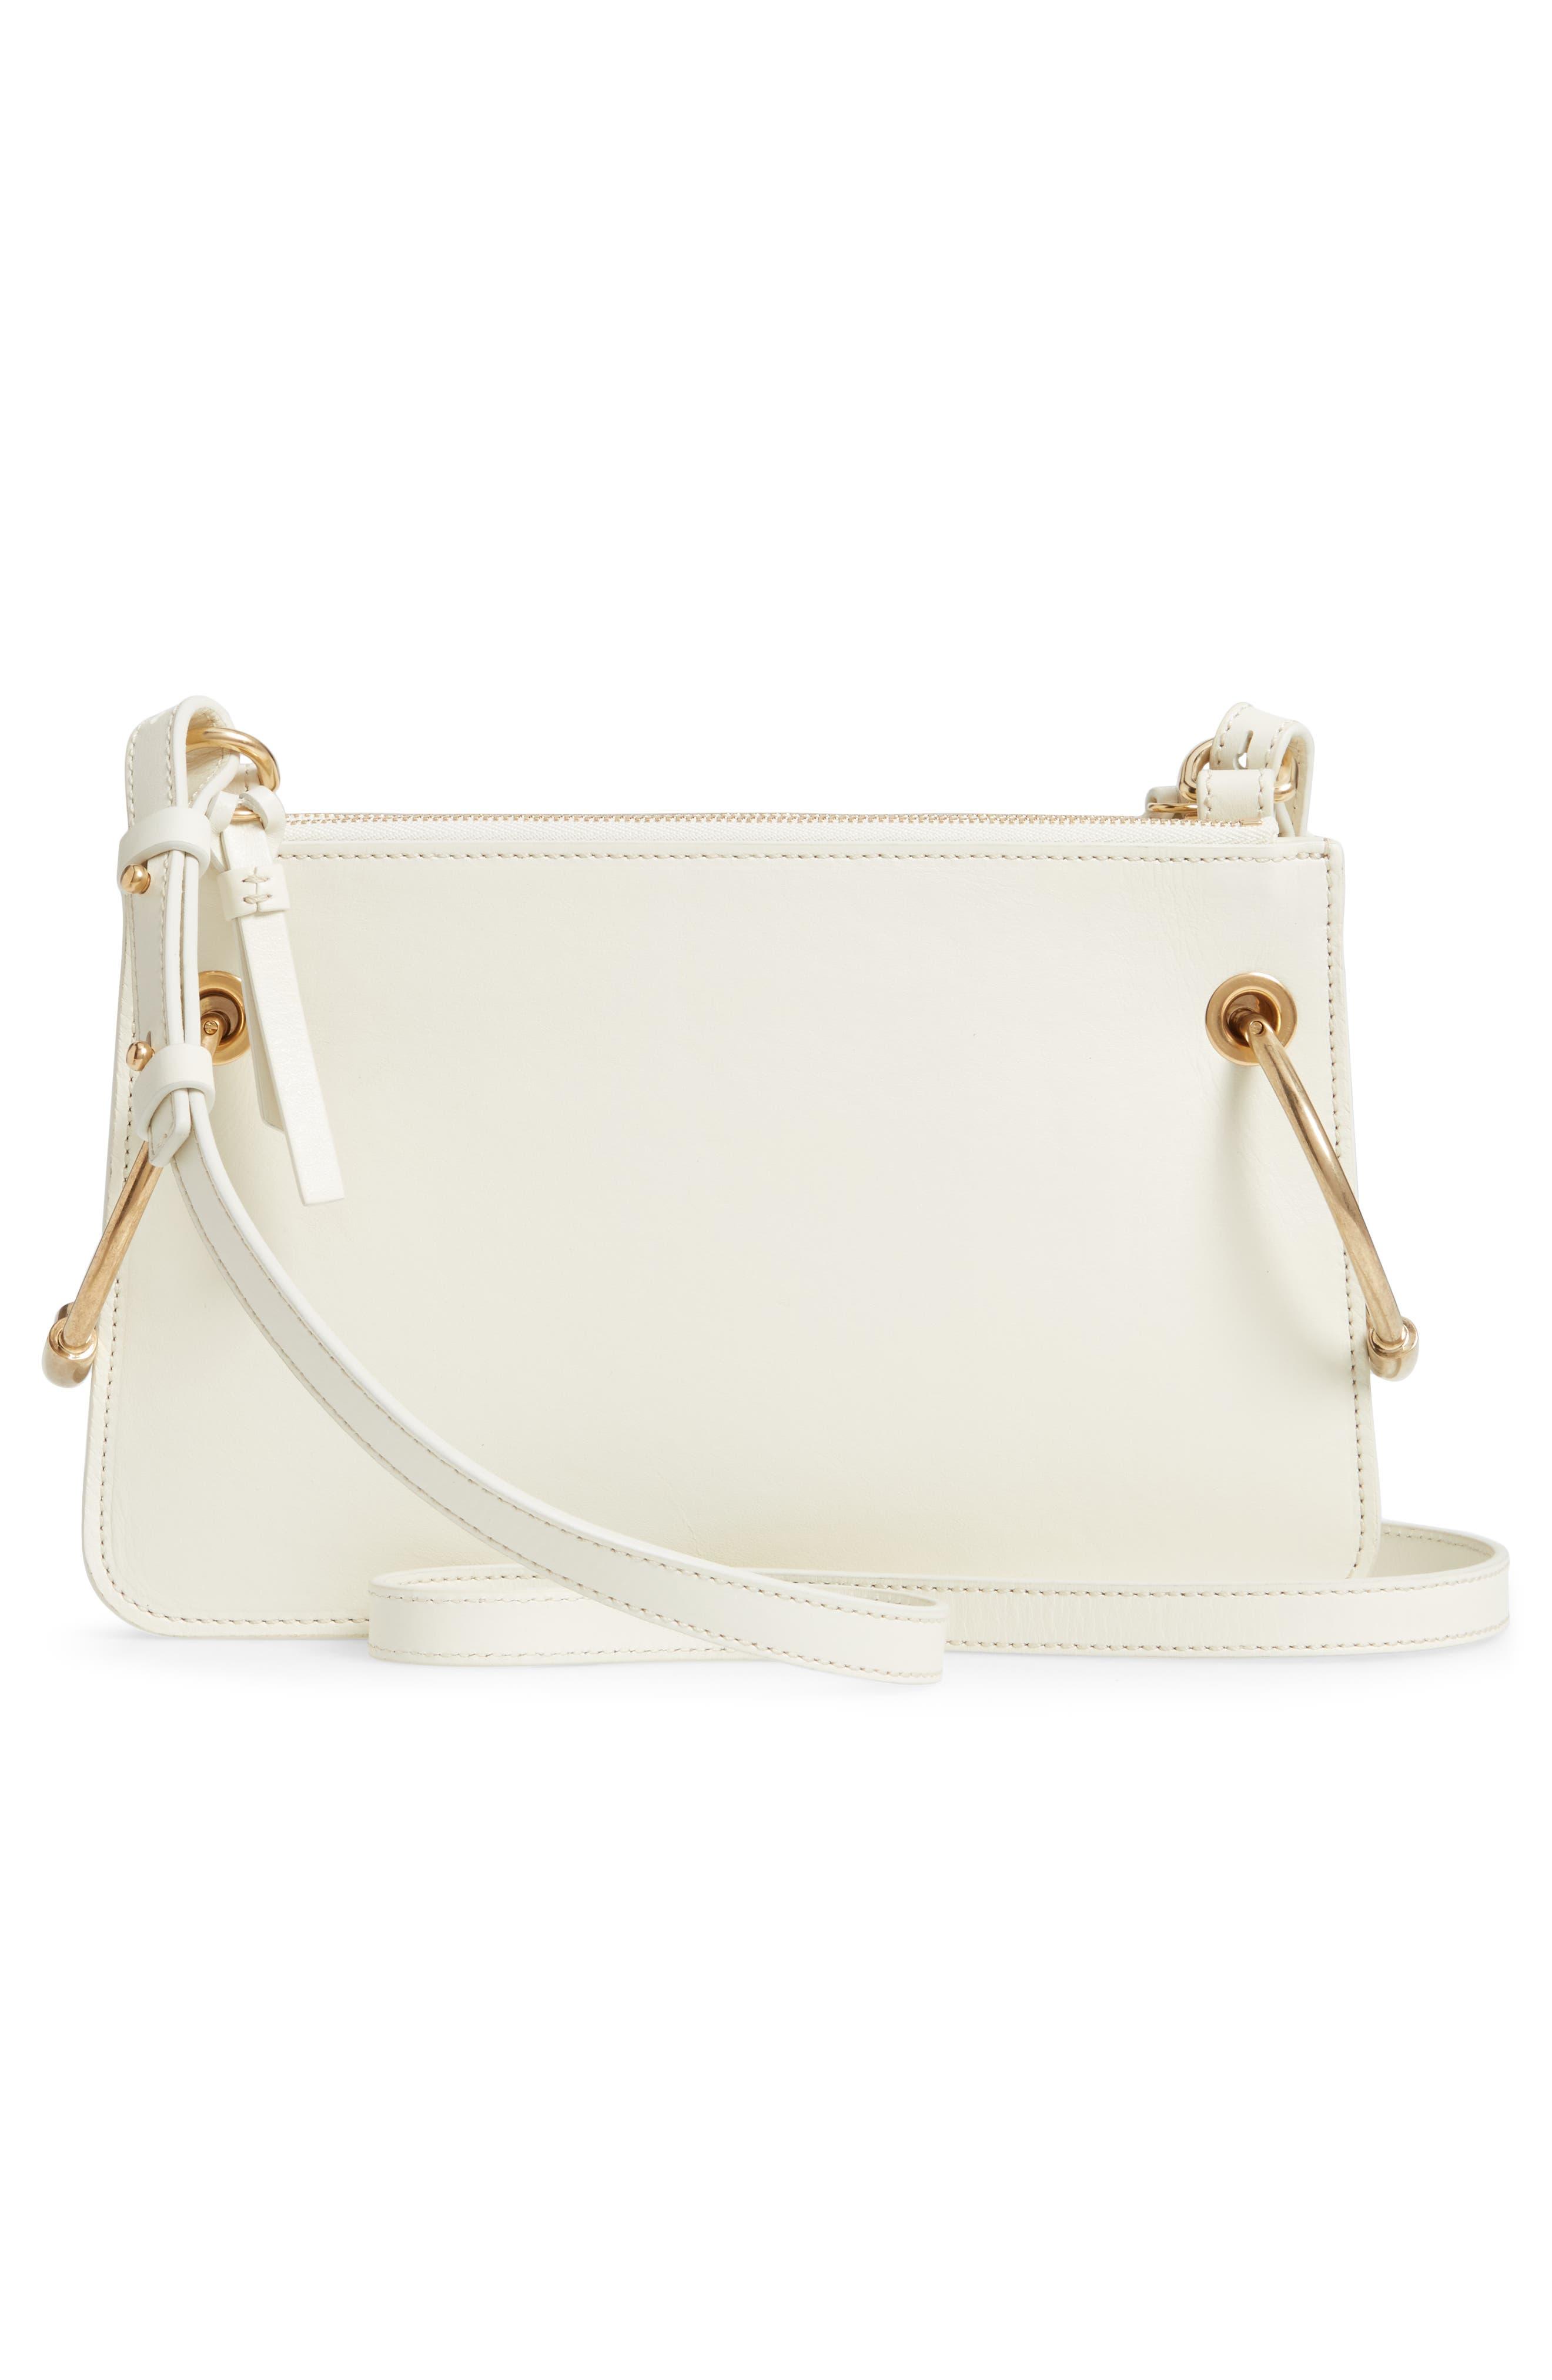 CHLOÉ,                             Small Roy Leather Shoulder Bag,                             Alternate thumbnail 3, color,                             NATURAL WHITE